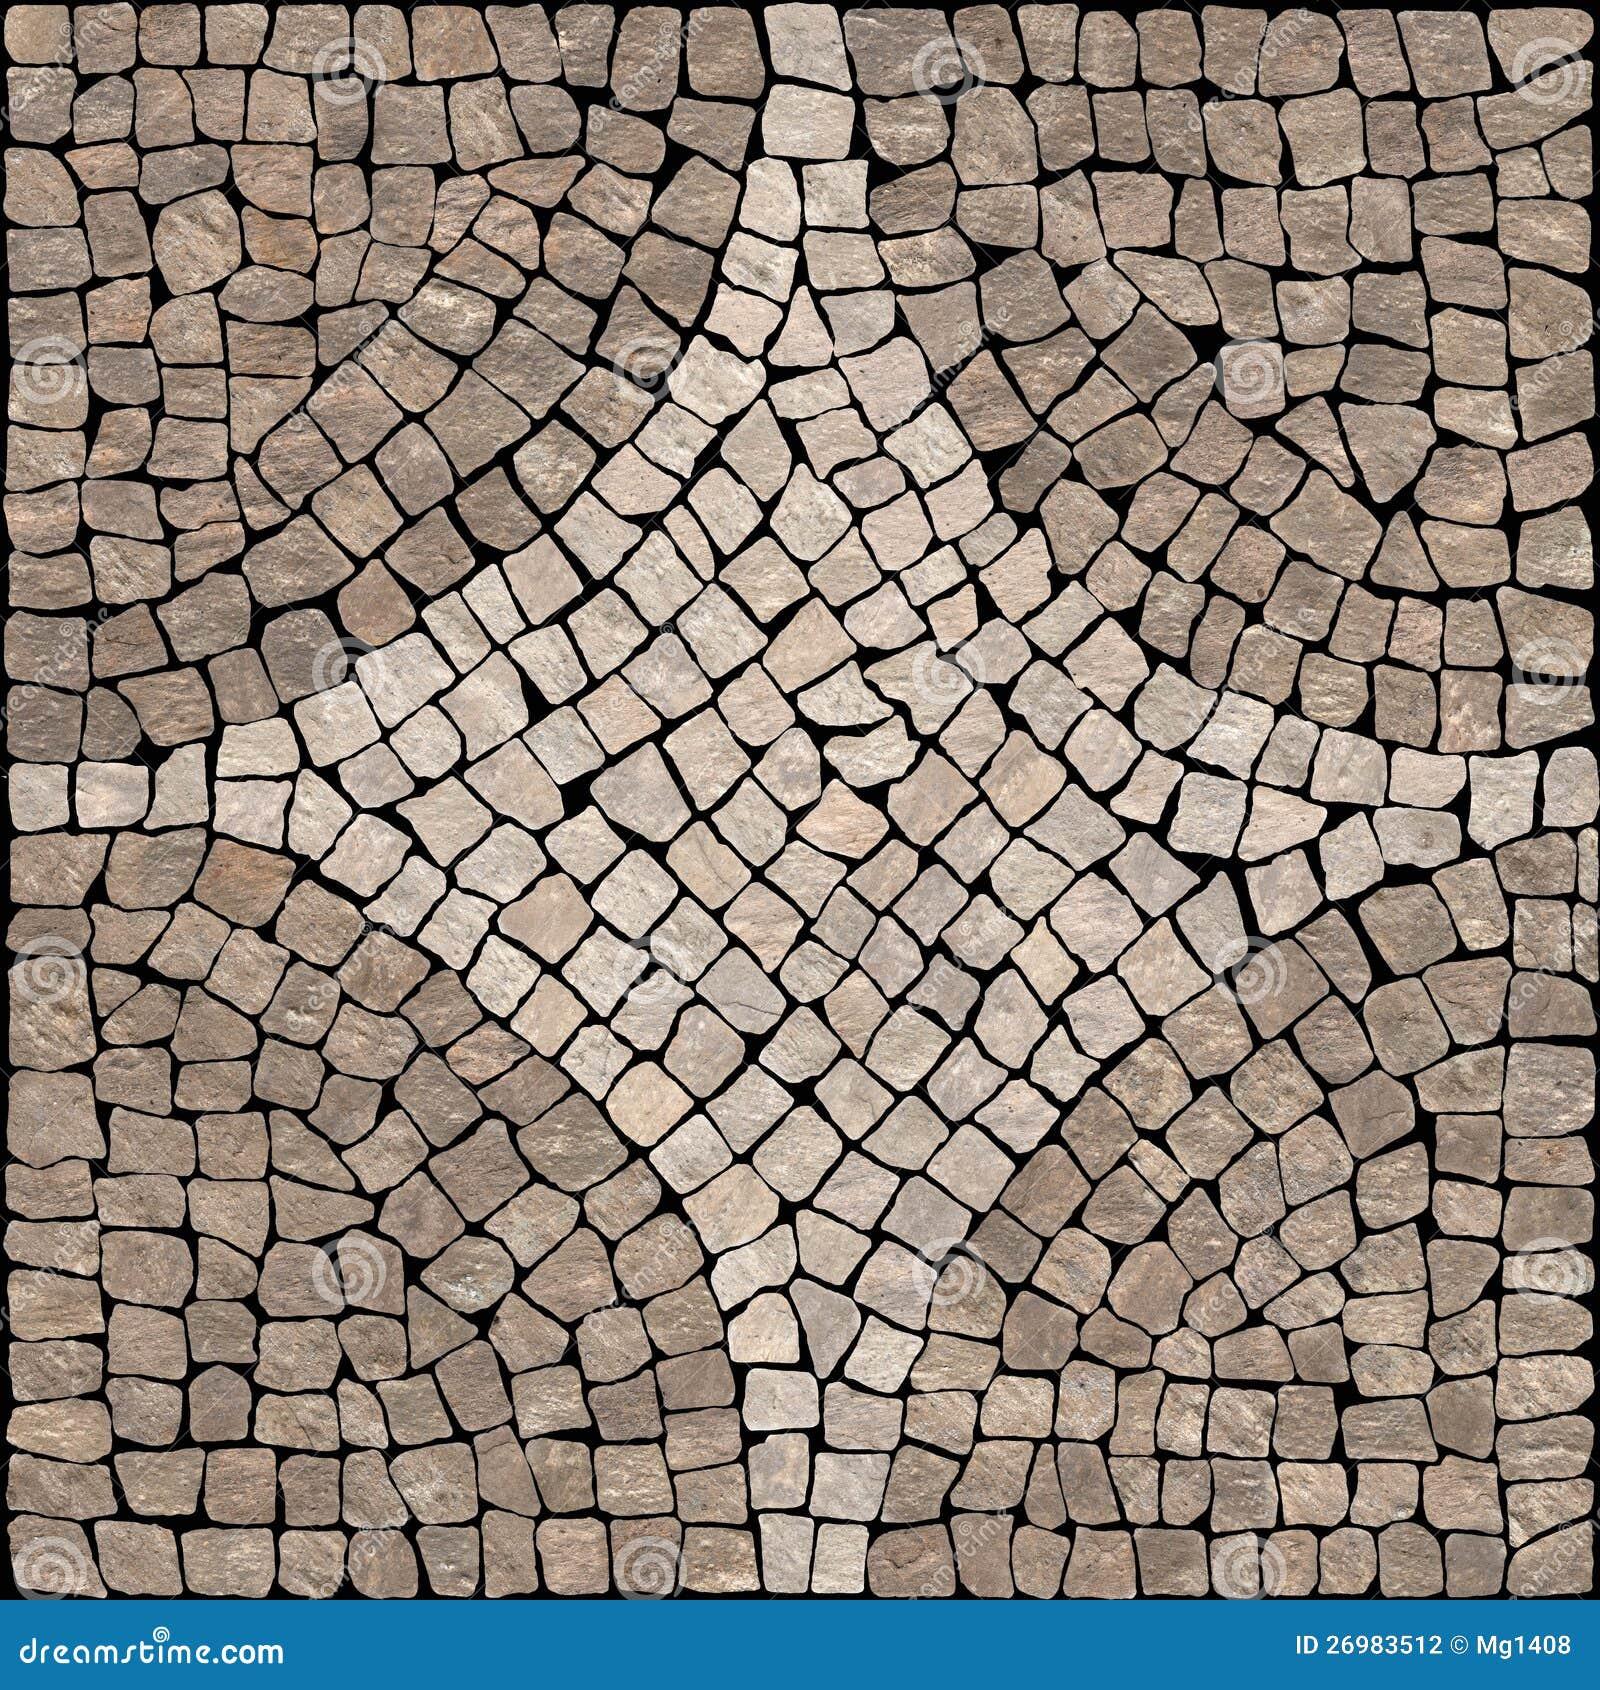 Sardis Stone Mosaic Texture Stock Photo Image 26983512